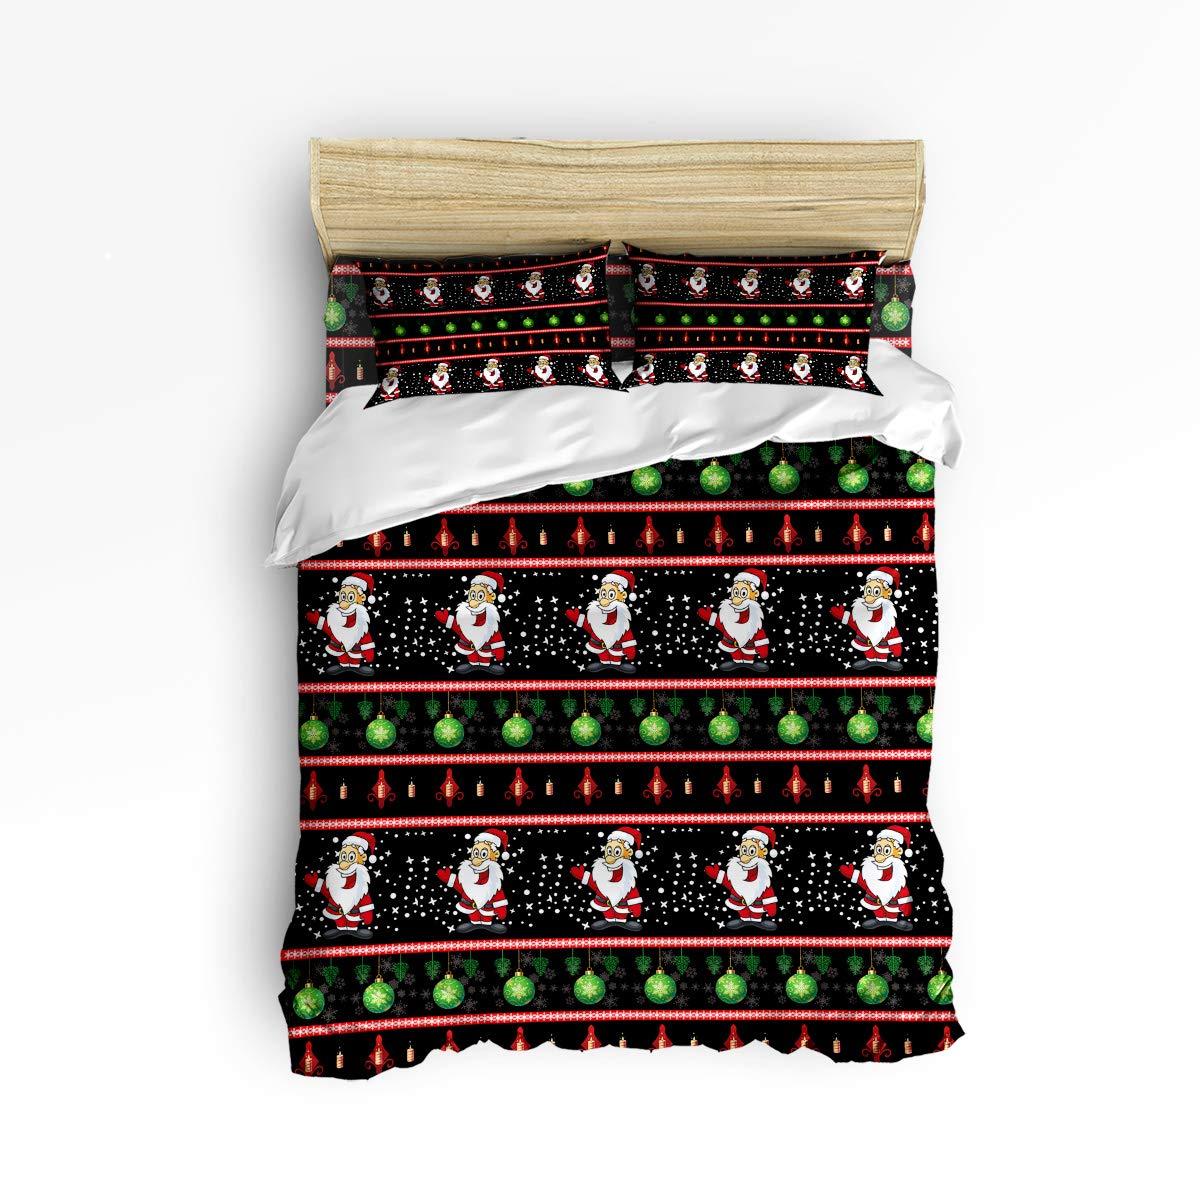 EZON-CH 4ピース布団カバーセット ソフトで快適な寝具セット 女の子/男の子用 カラフルな波状ブラックパターン 大人用ベッドシーツセット フラットシーツ1枚 掛け布団カバー1枚 枕カバー2枚 フルサイズ 20181210WHLEZONSJTTSLXM02302SJTBEZN B07L8LJ653 Christmas 1516lezn1042 フルサイズ